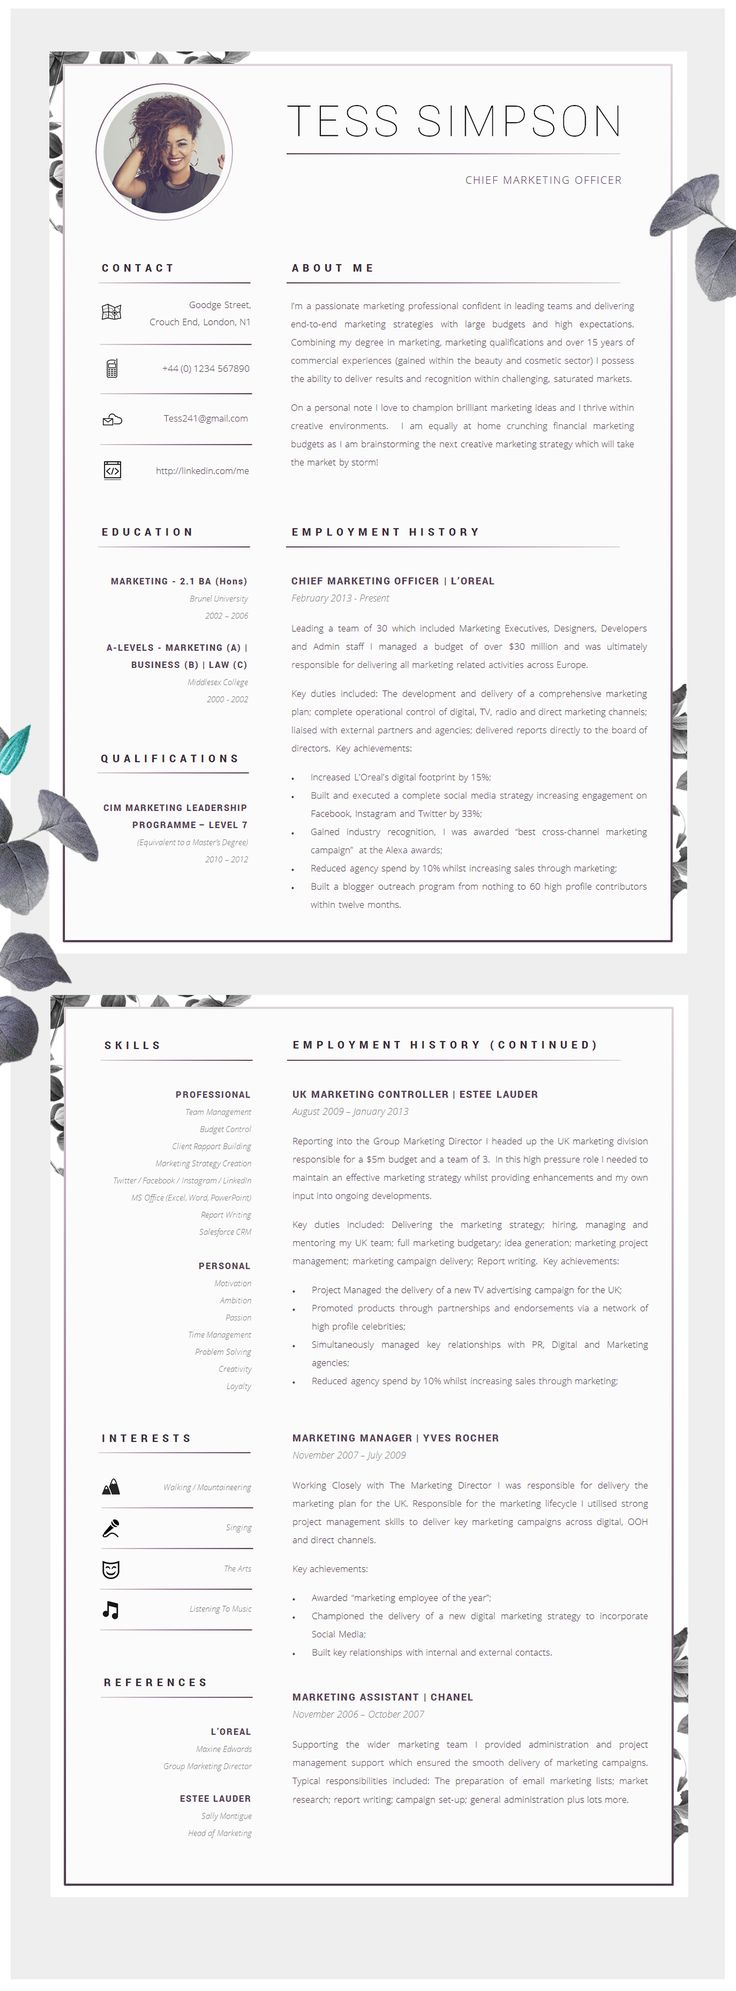 resume cv design resume design cv resume